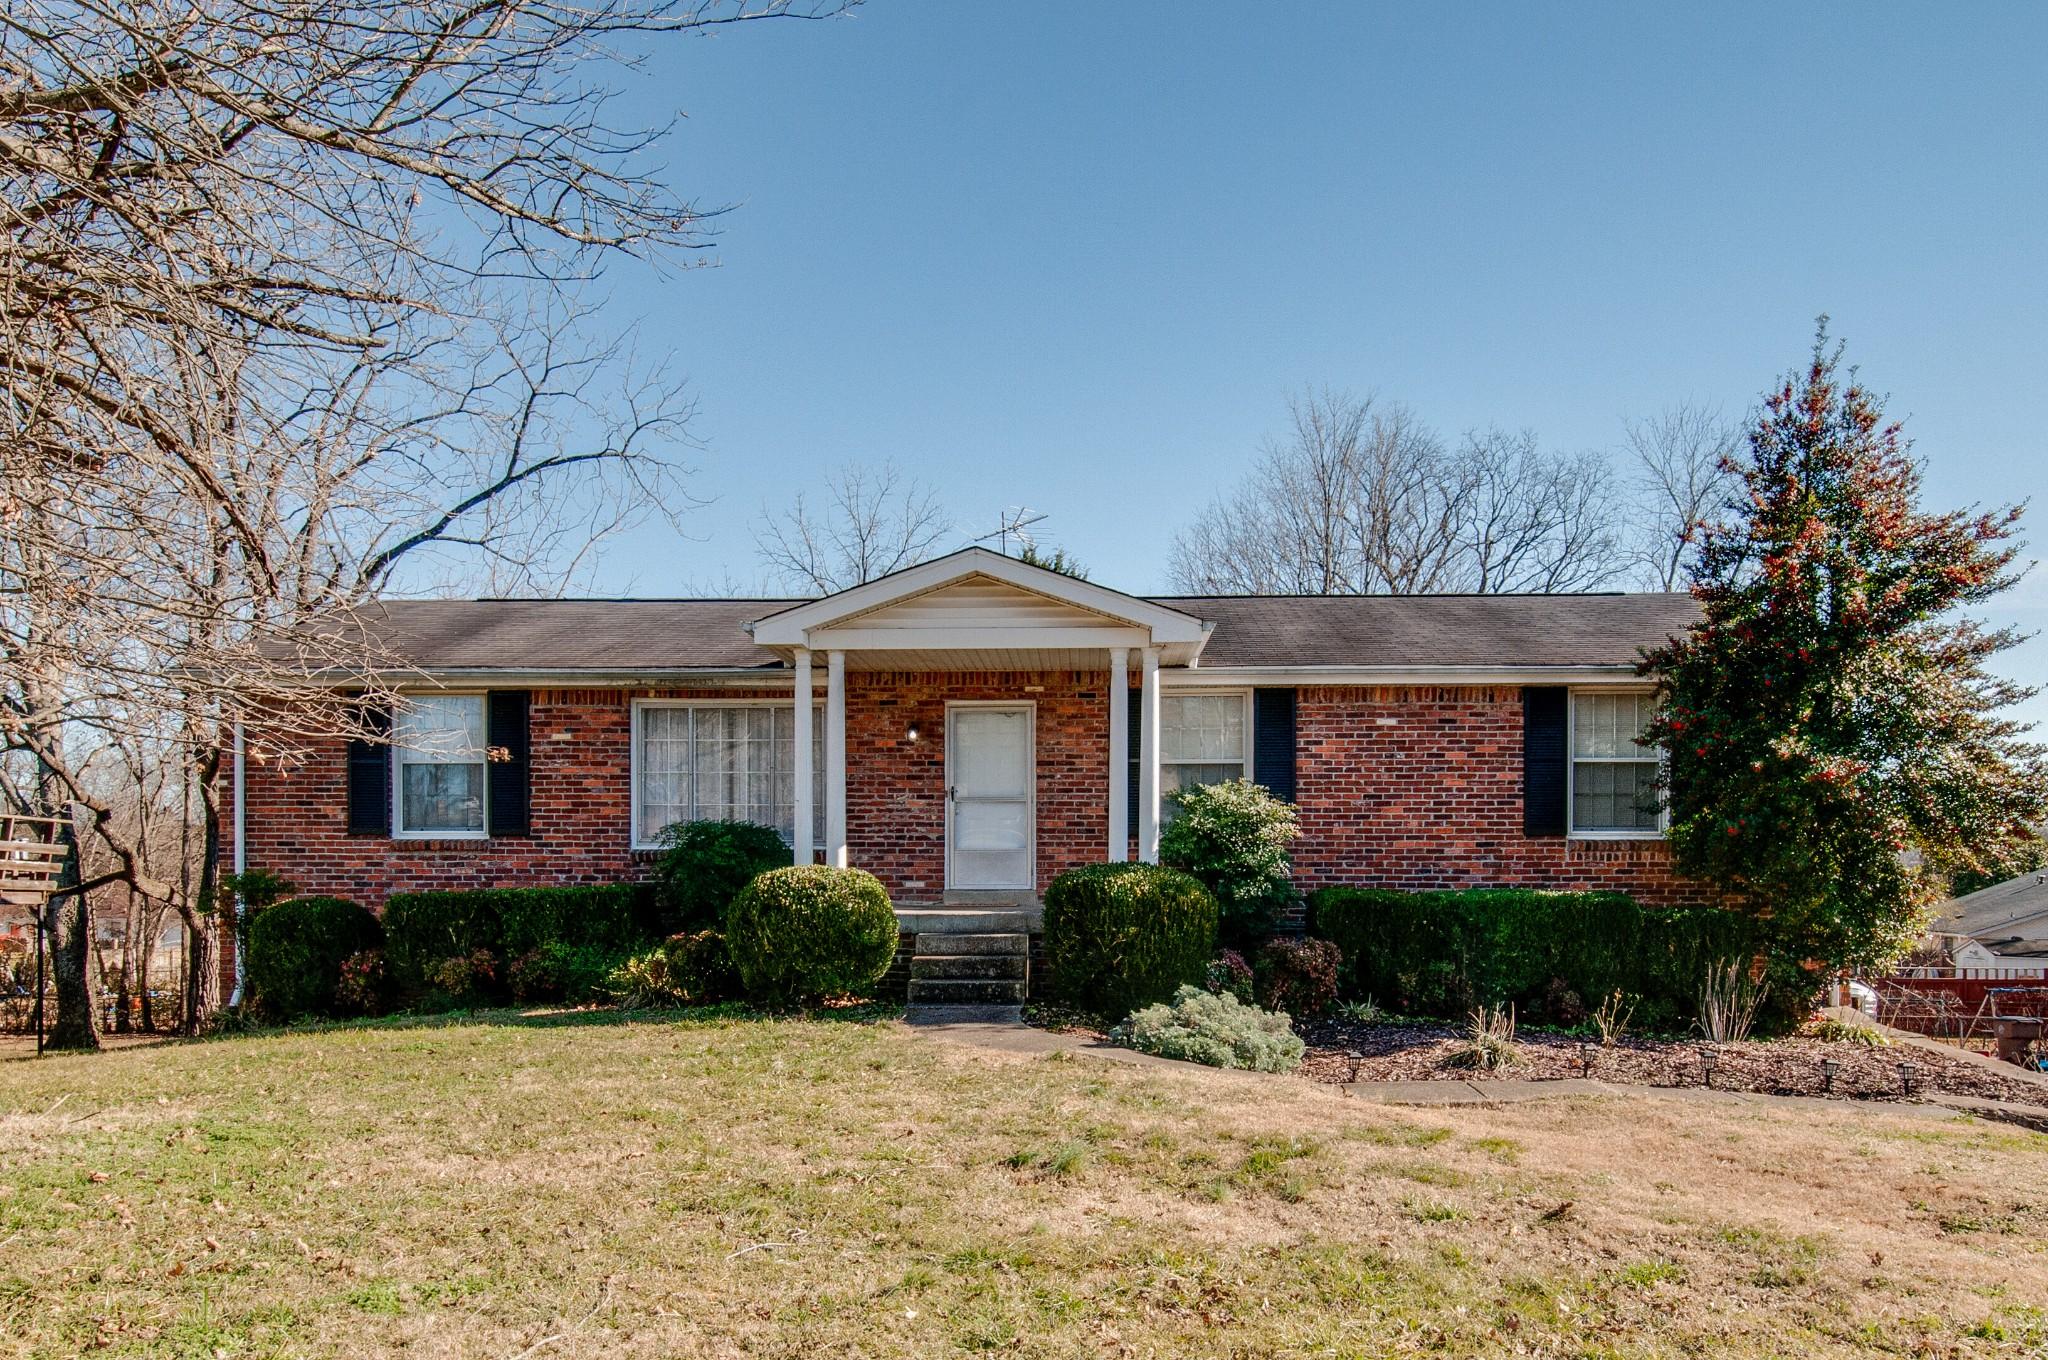 252 Sailboat Dr Property Photo - Nashville, TN real estate listing